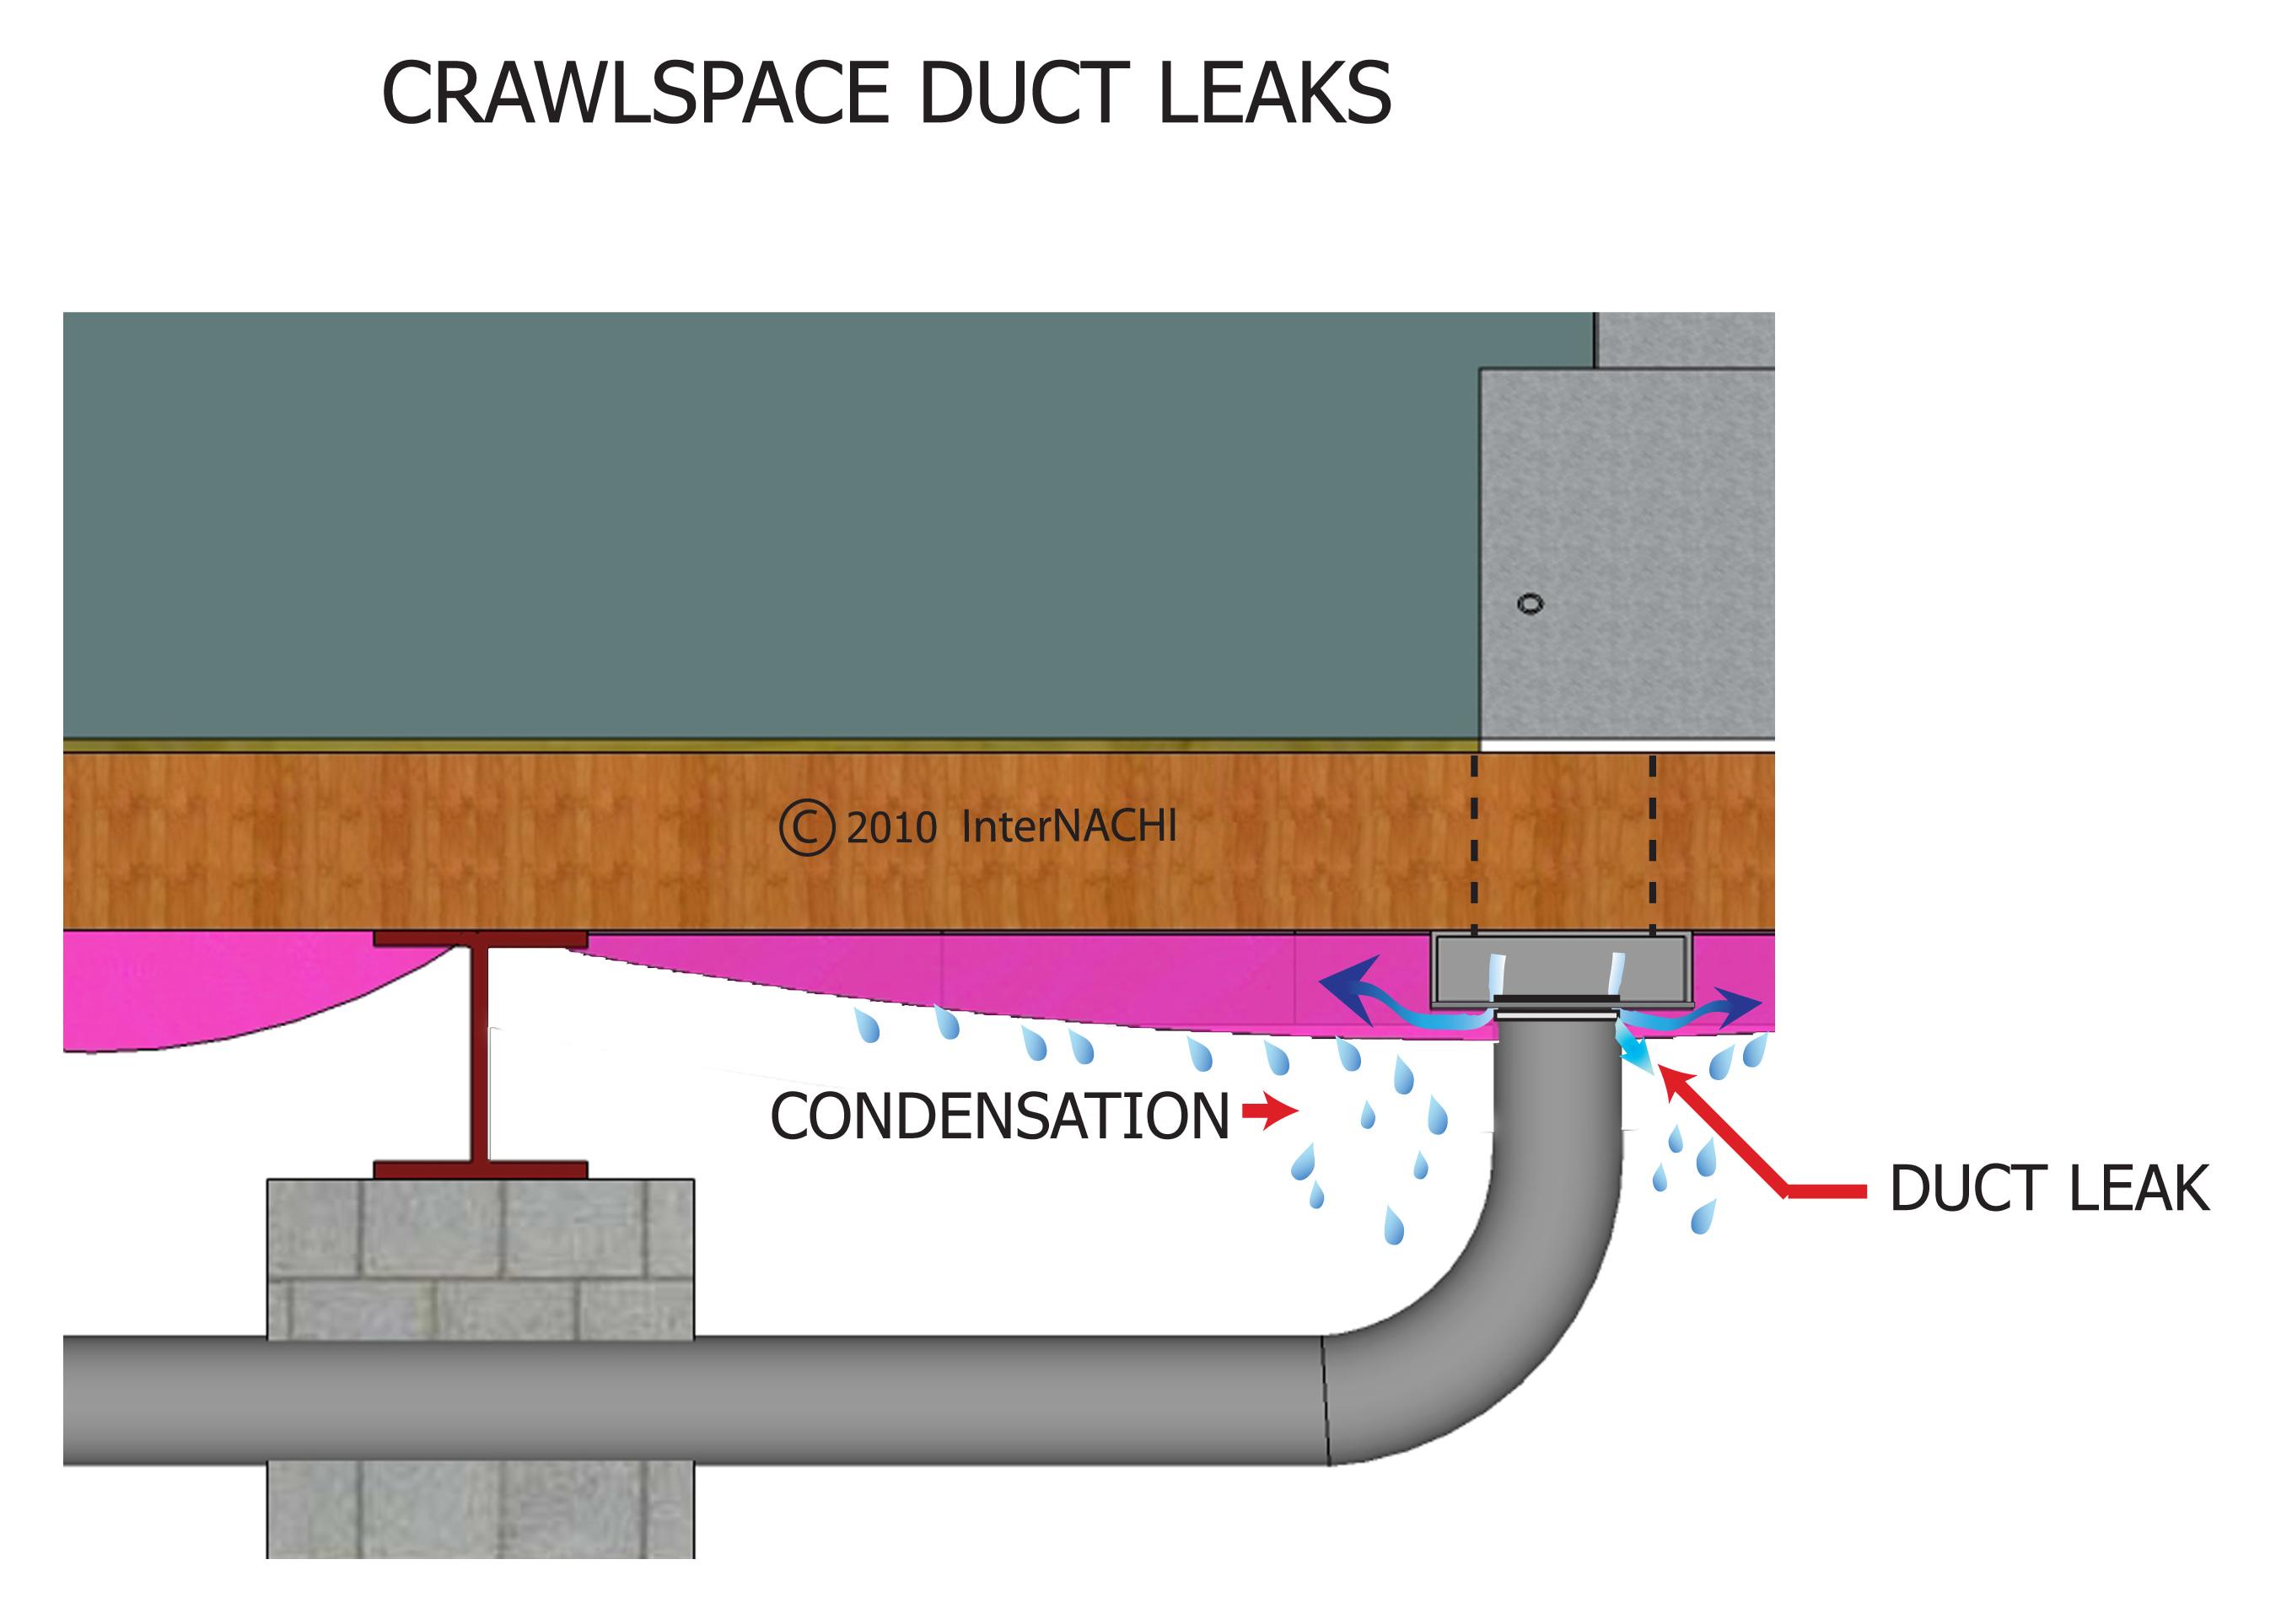 Crawlspace duct leaks.